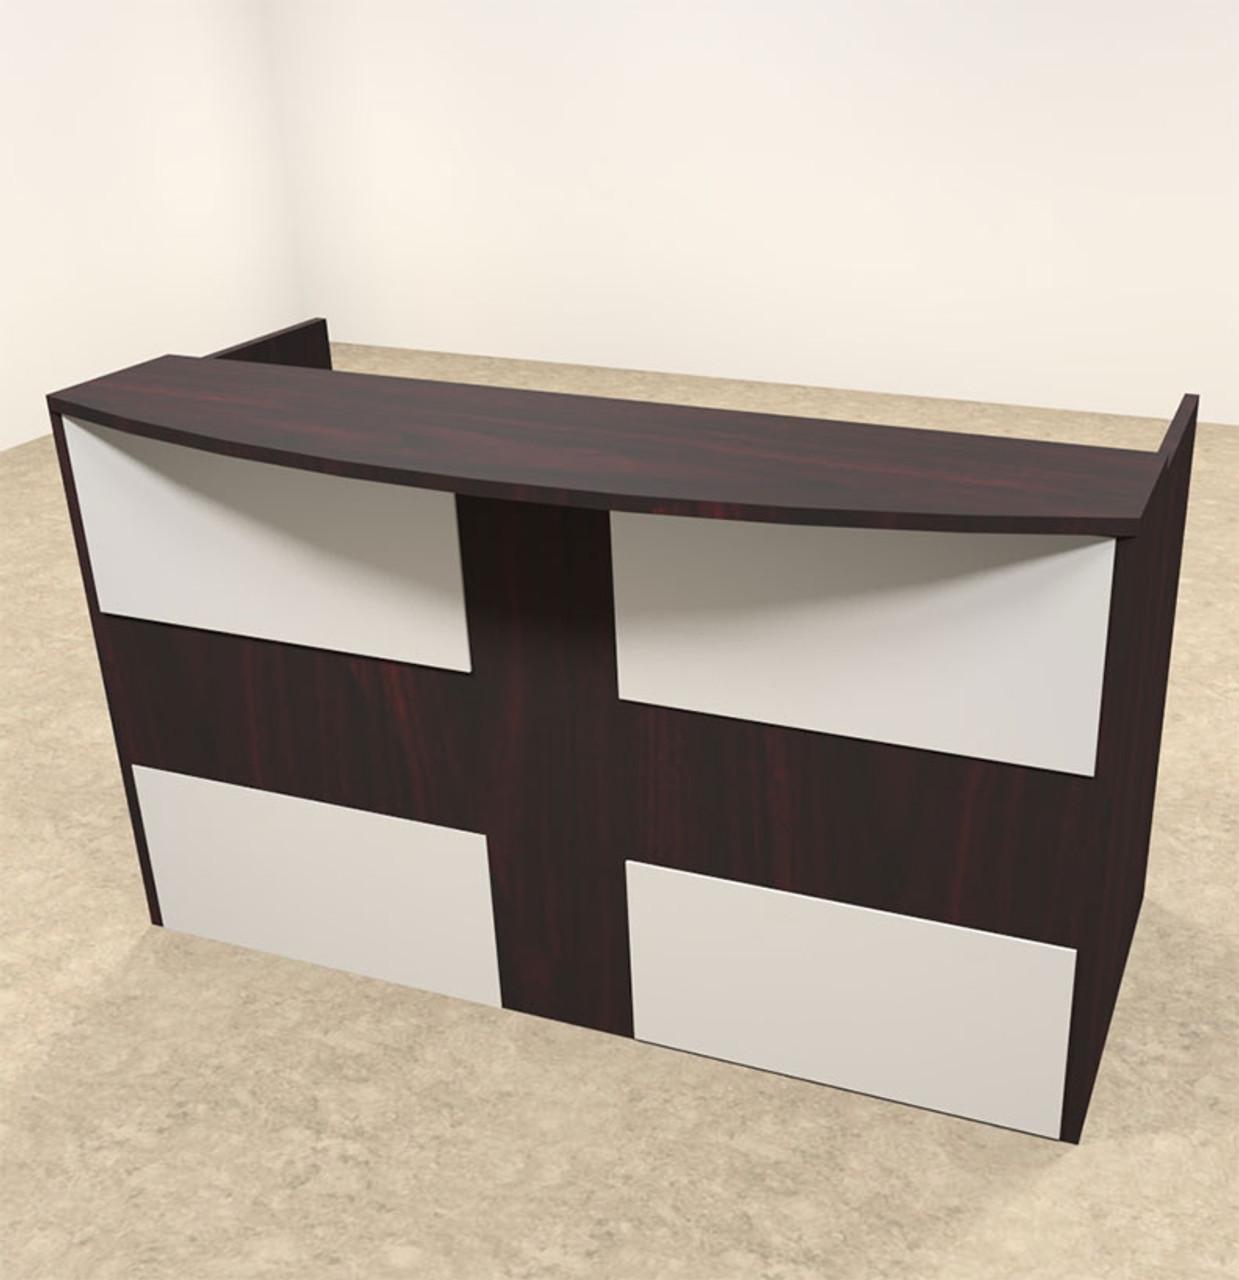 2pc Rectangular Modern Acrylic Panel Office Reception Desk, #OT-SUL-R15